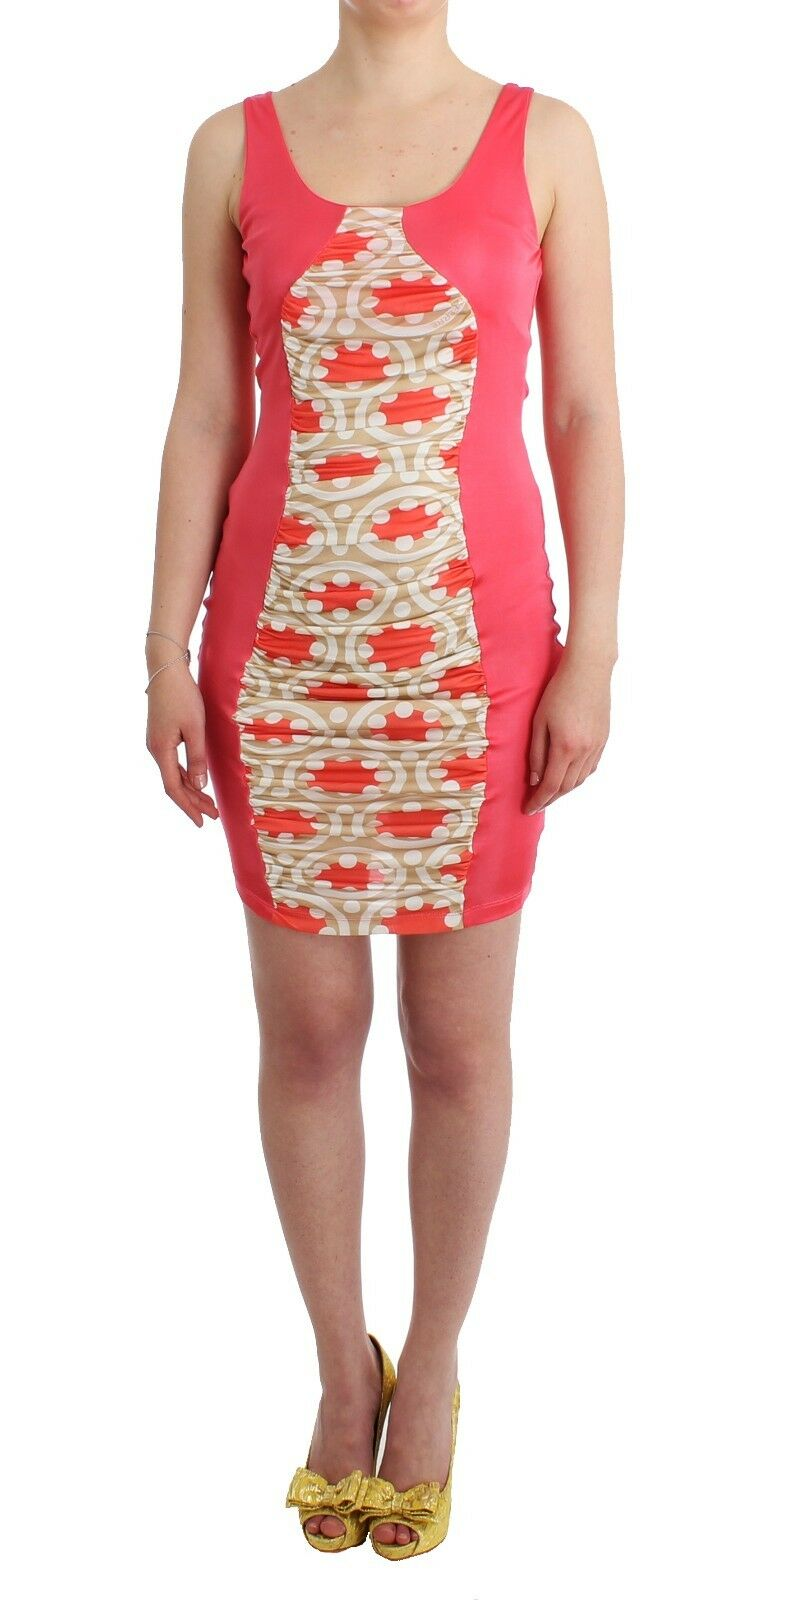 NEW  GF Gianfranco Ferre Dress Short Mini MultiFarbe Rosa Bodycon IT42   US8